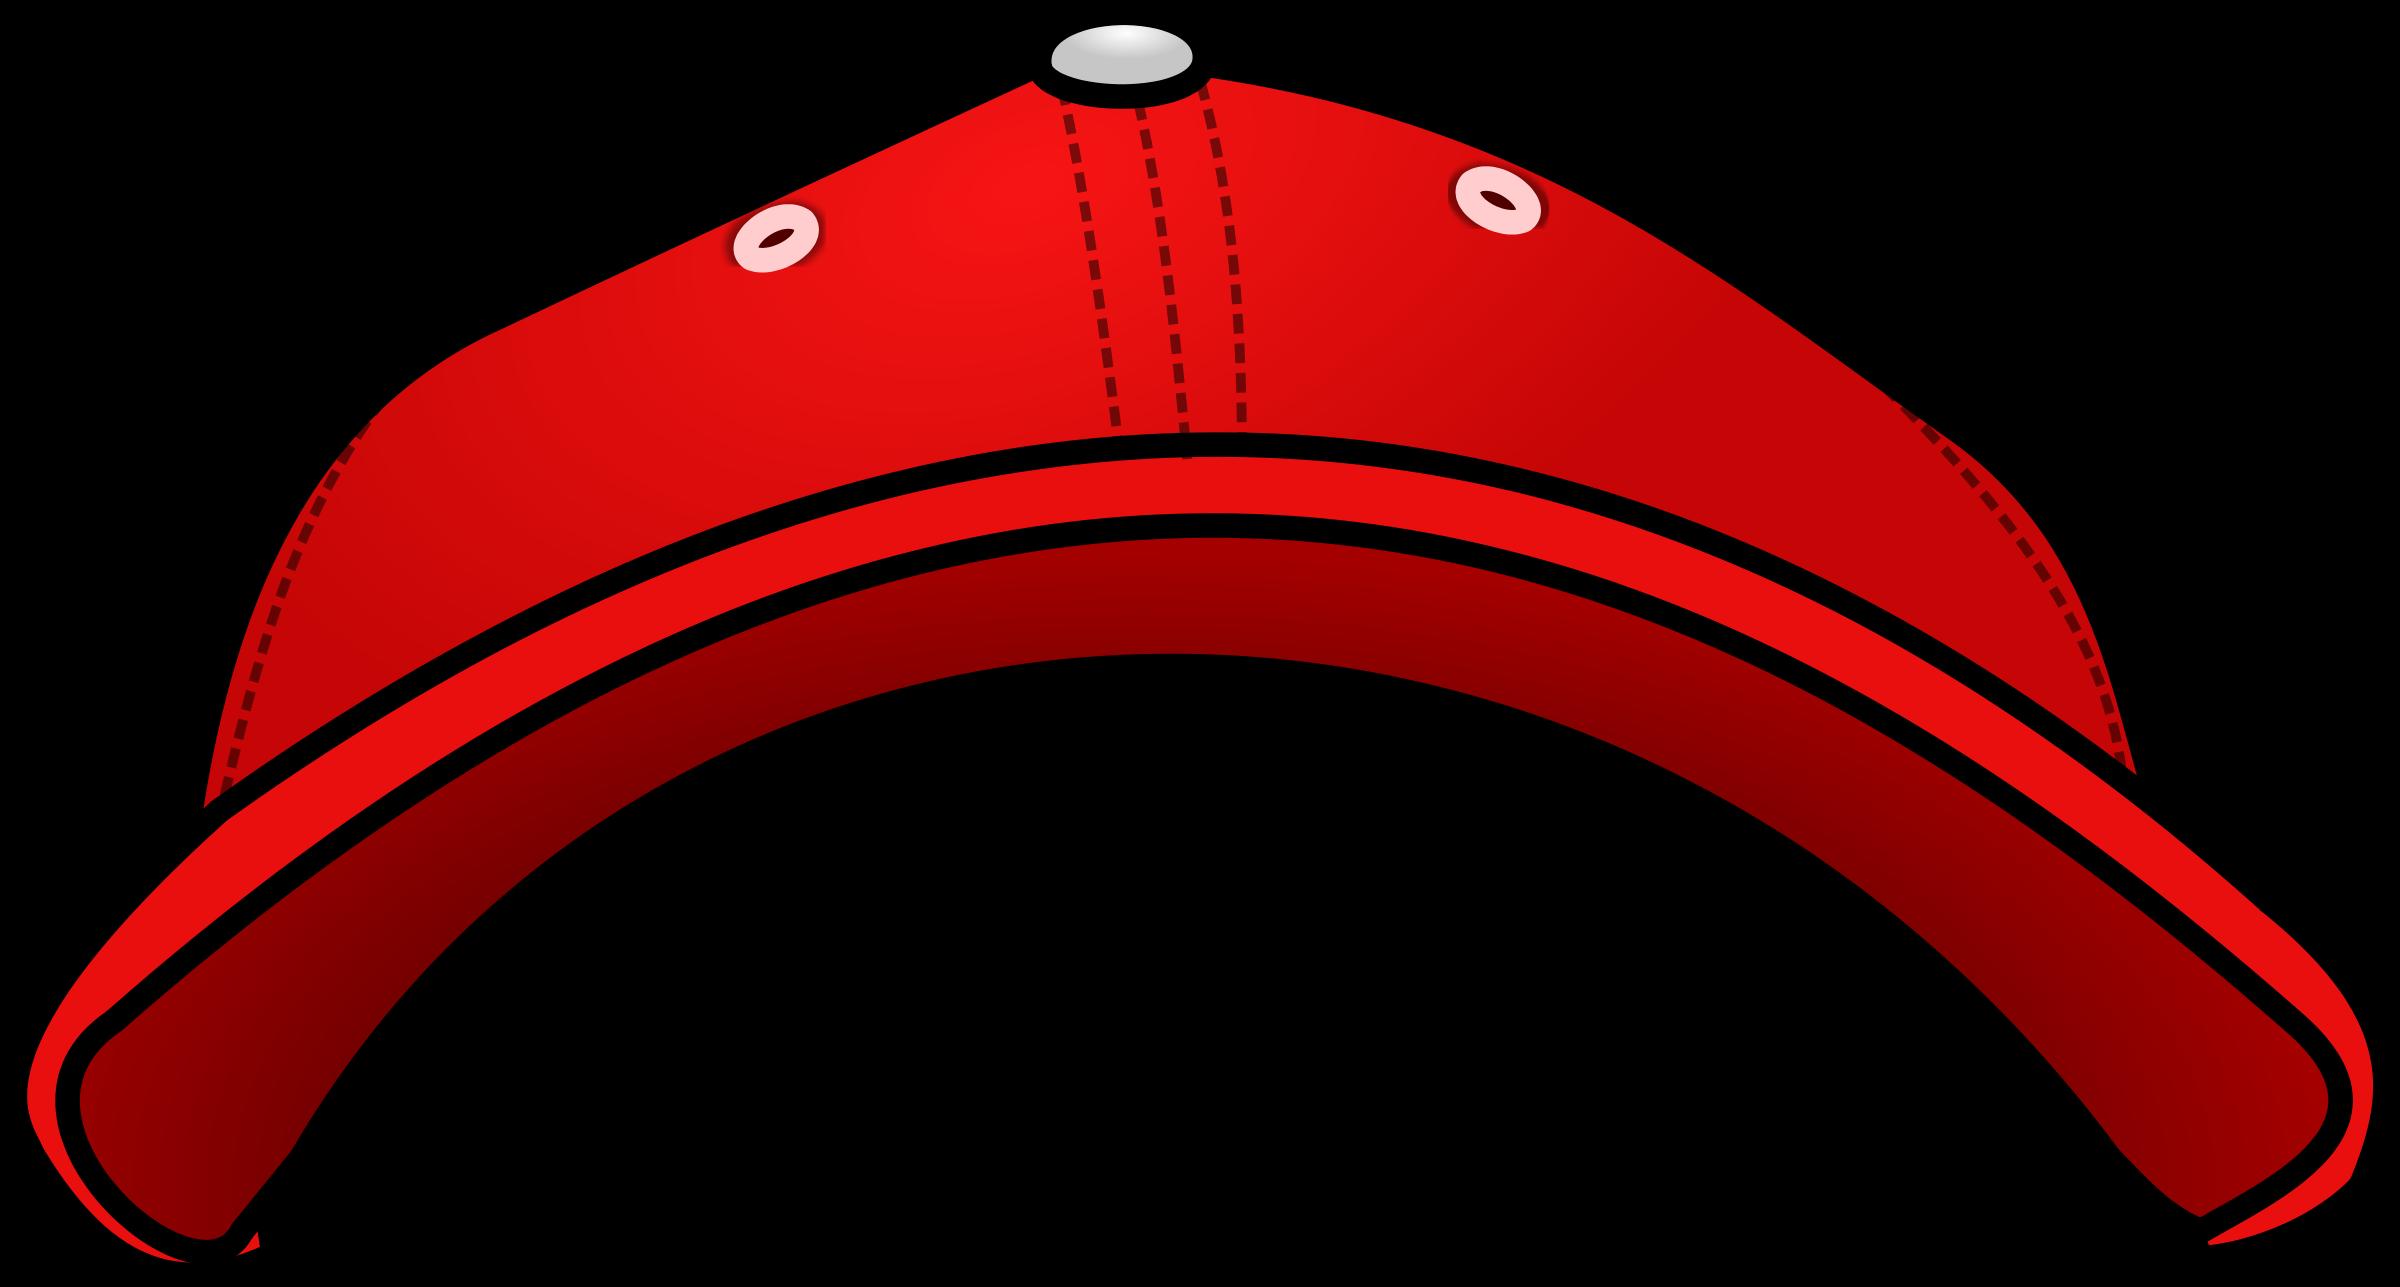 cartoon baseball hat baseball hat clipart silhouette baseball hat clipart silhouette